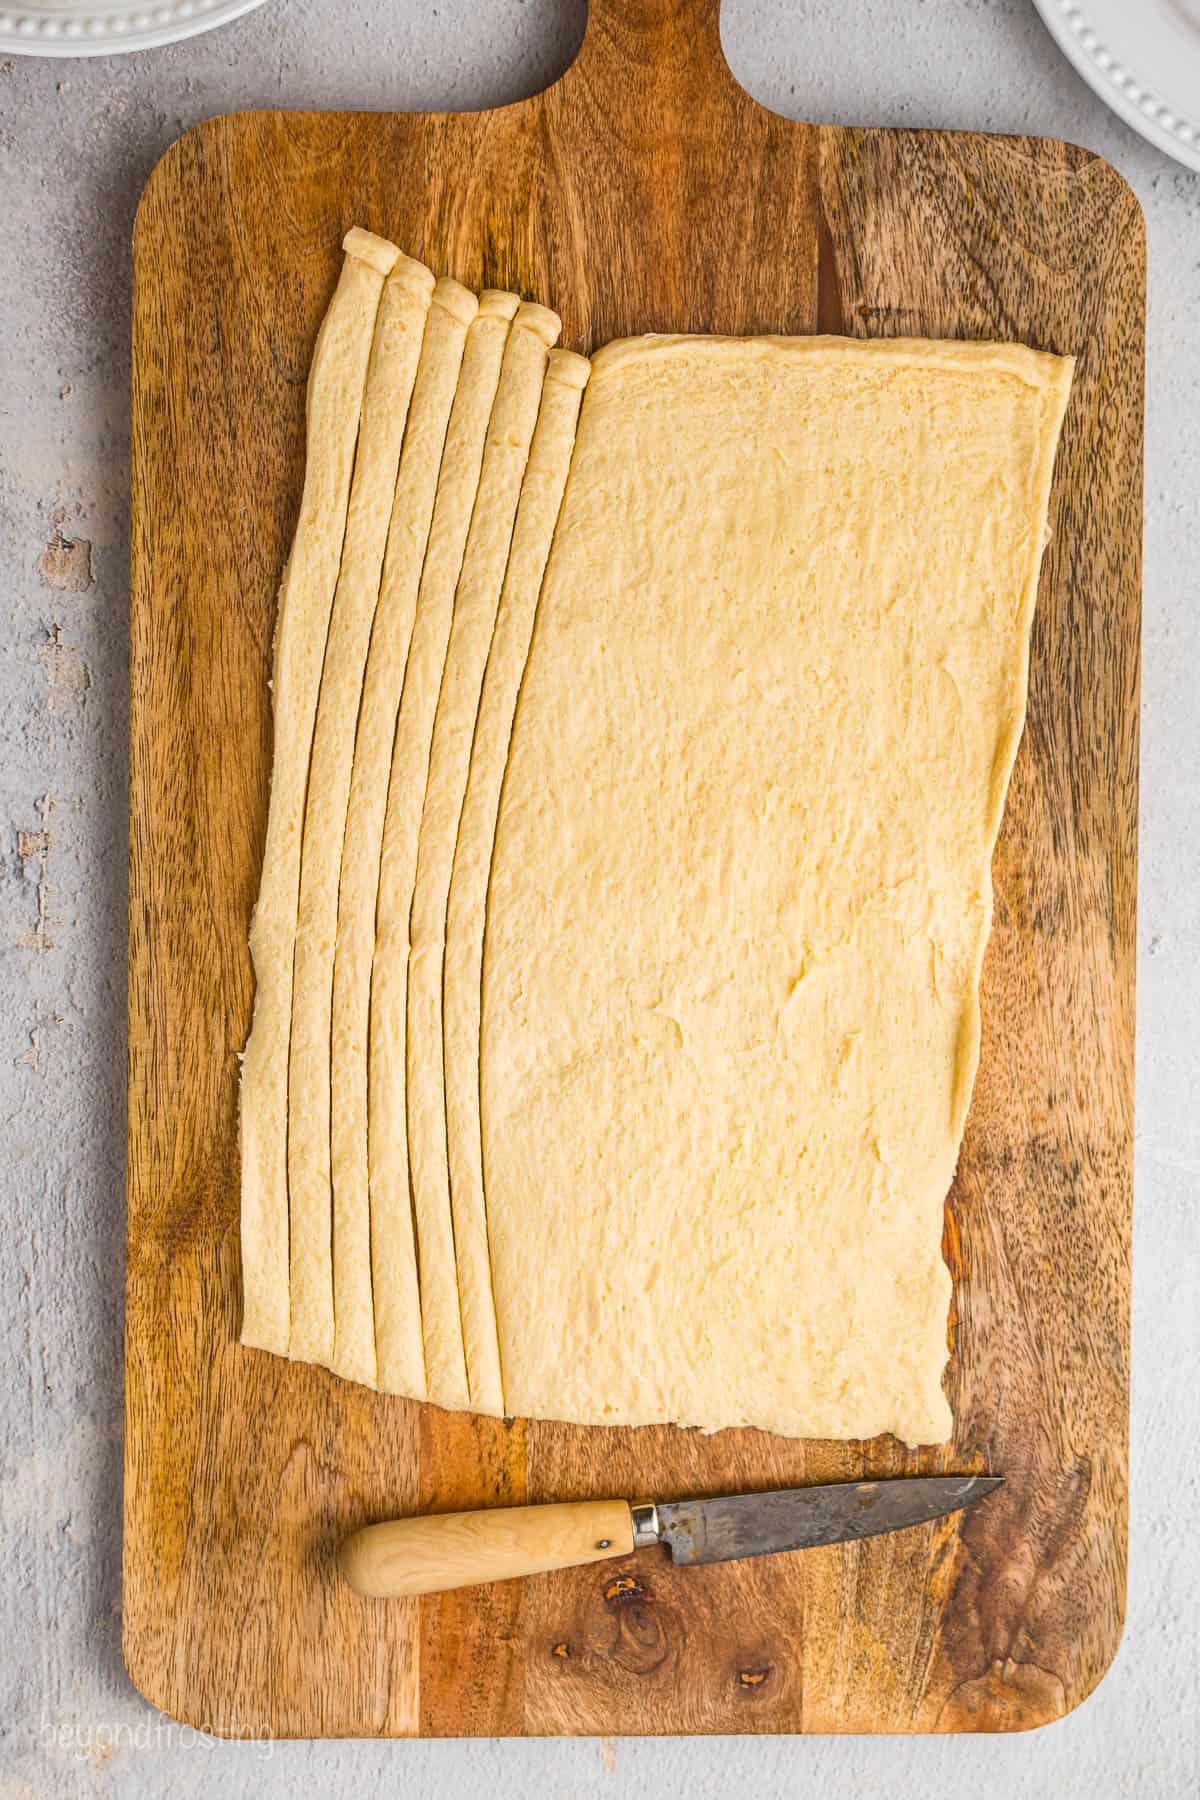 A Pillsbury crescent dough sheet with 6 thin strips cut off of it